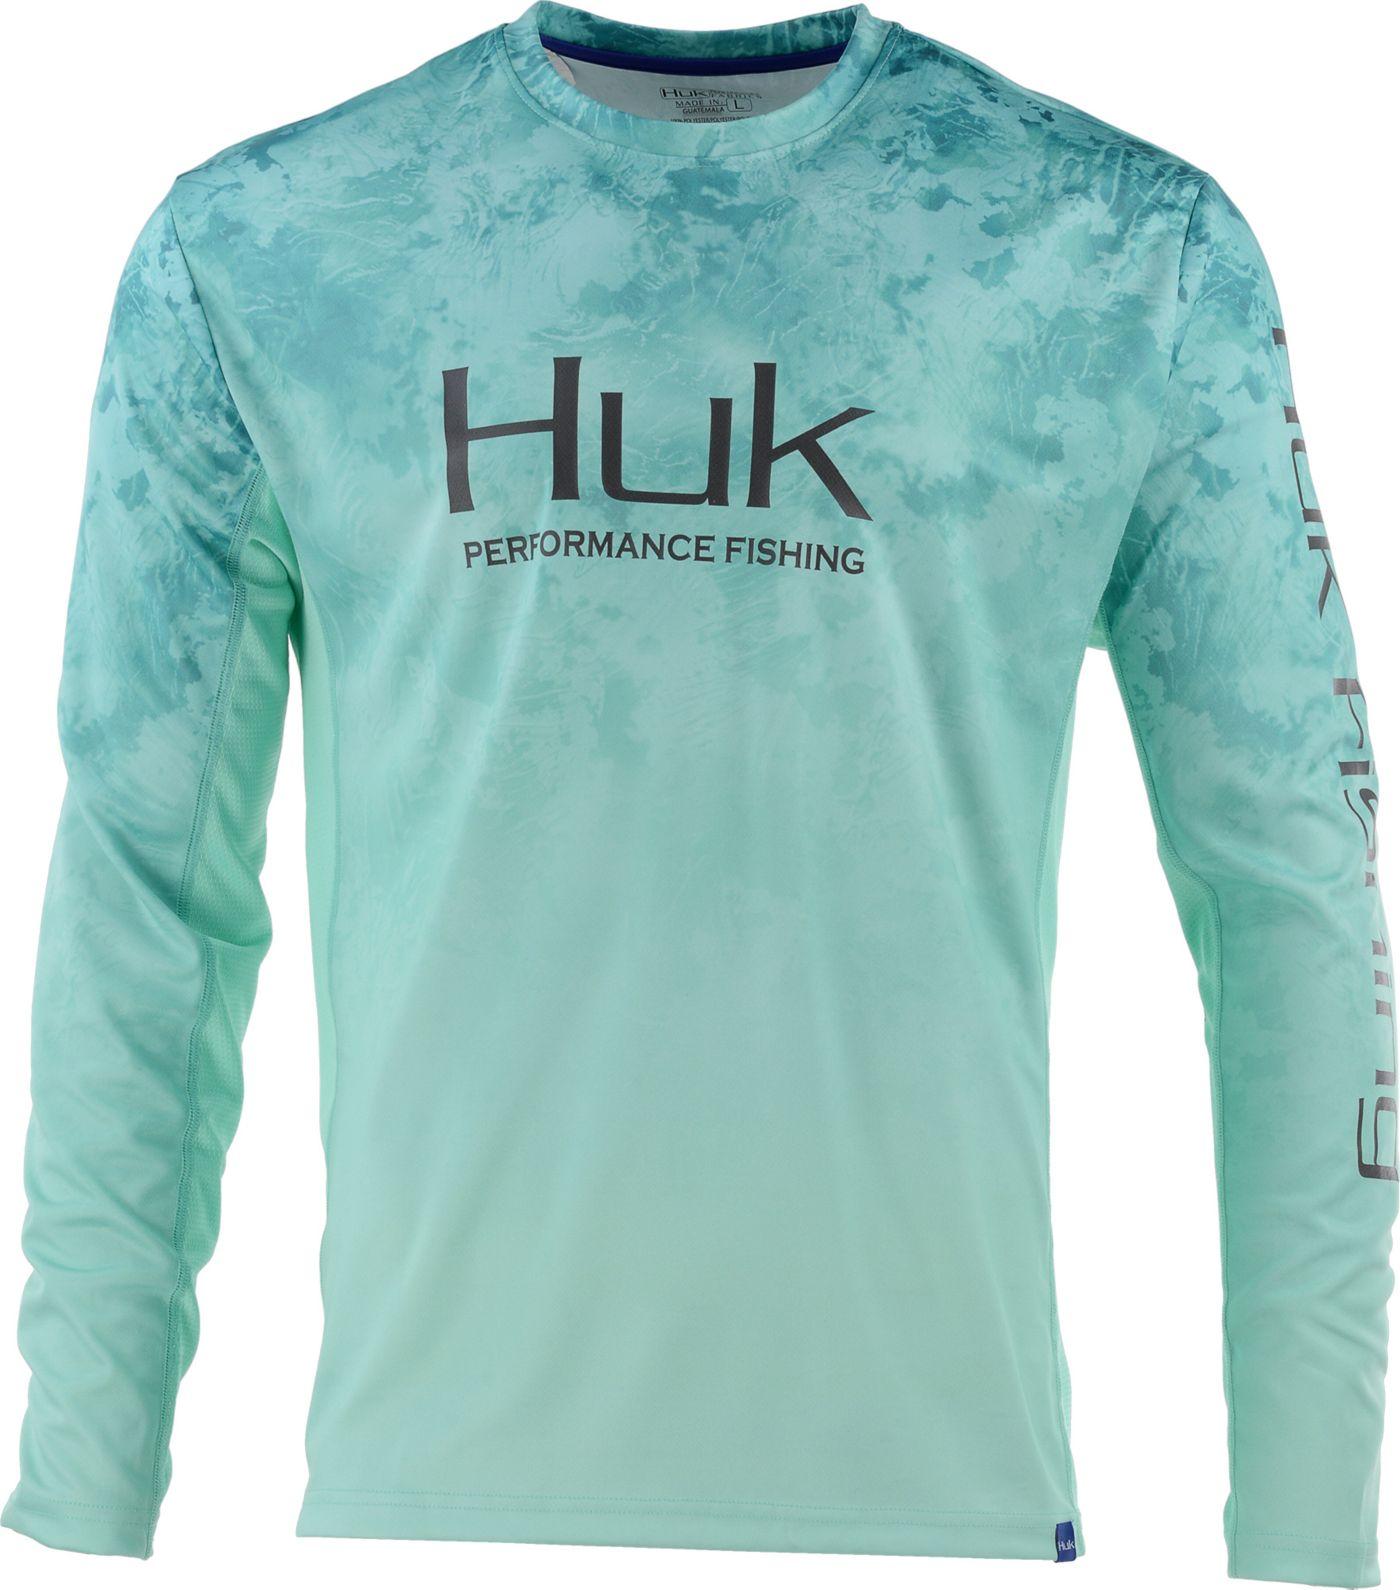 HUK Men's Icon X Camo Fade Performance Fishing Long Sleeve Shirt (Regular and Big & Tall)